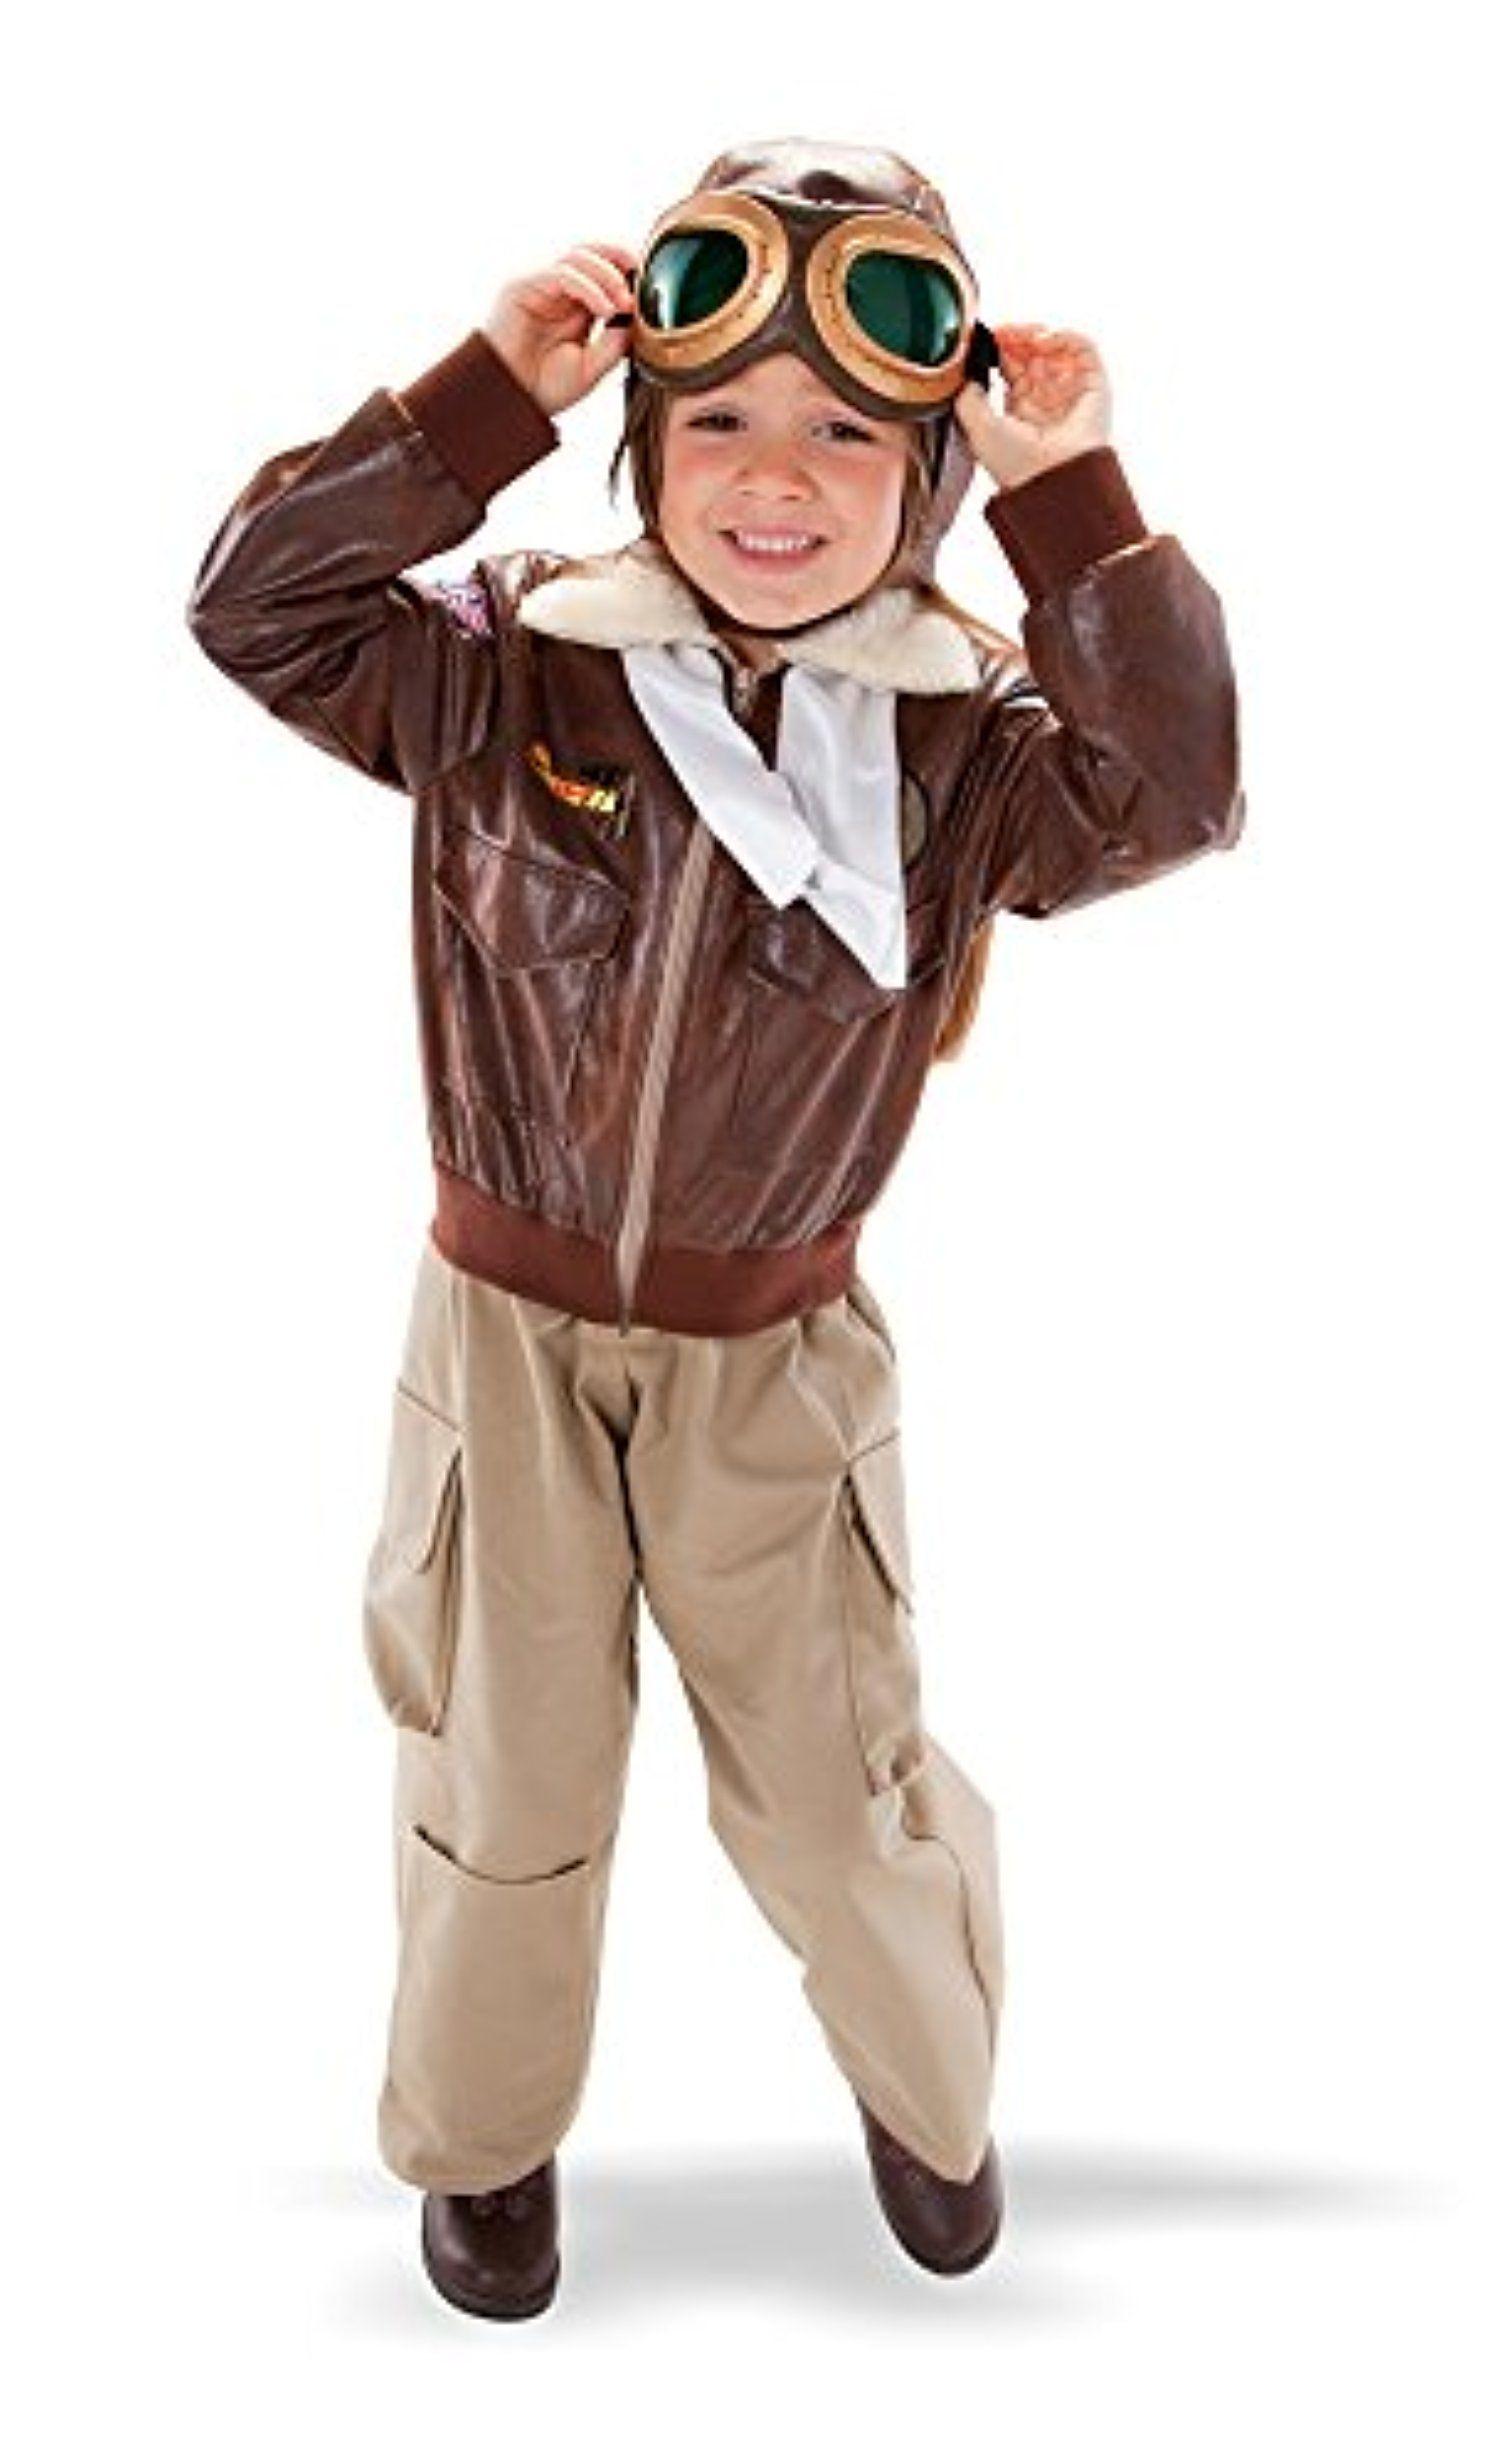 TeeTot Aviator Pilot Costume Size 5-6 with Jacket 65f43c4416c3